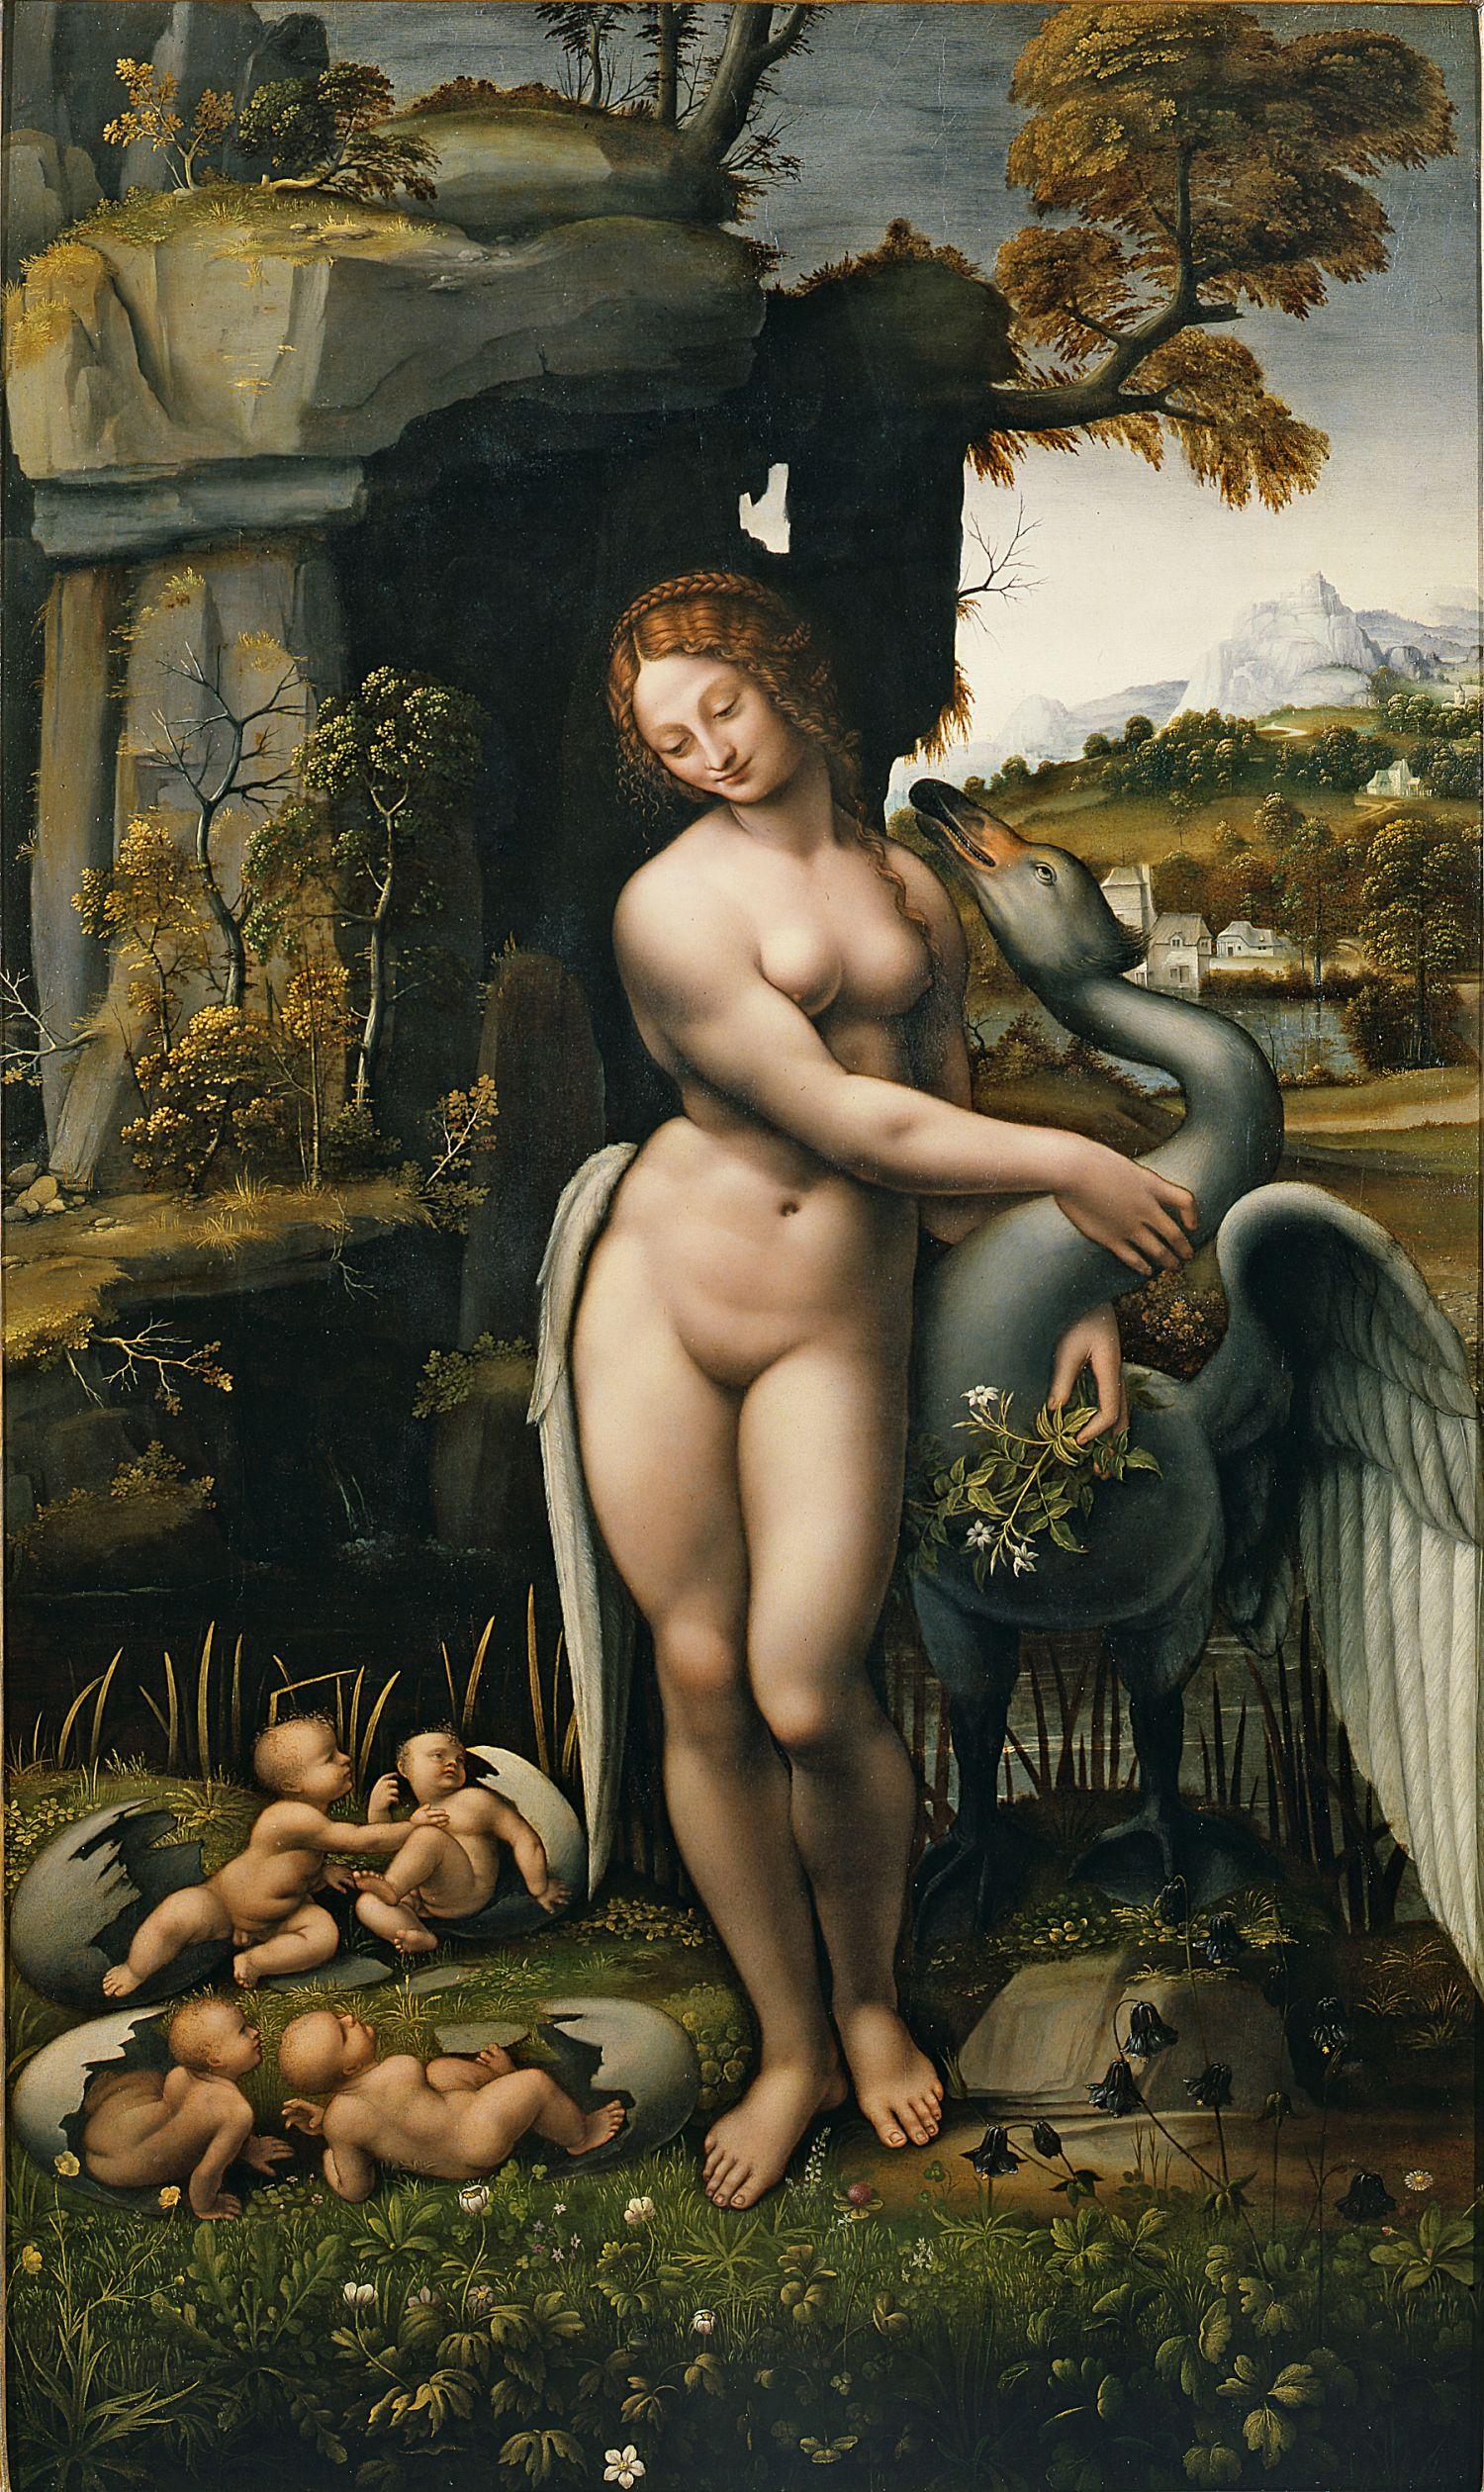 Unknown Copyist ofLeonardo da Vinci, Spiridon Leda, Oil on wood, ca. 1505-1507